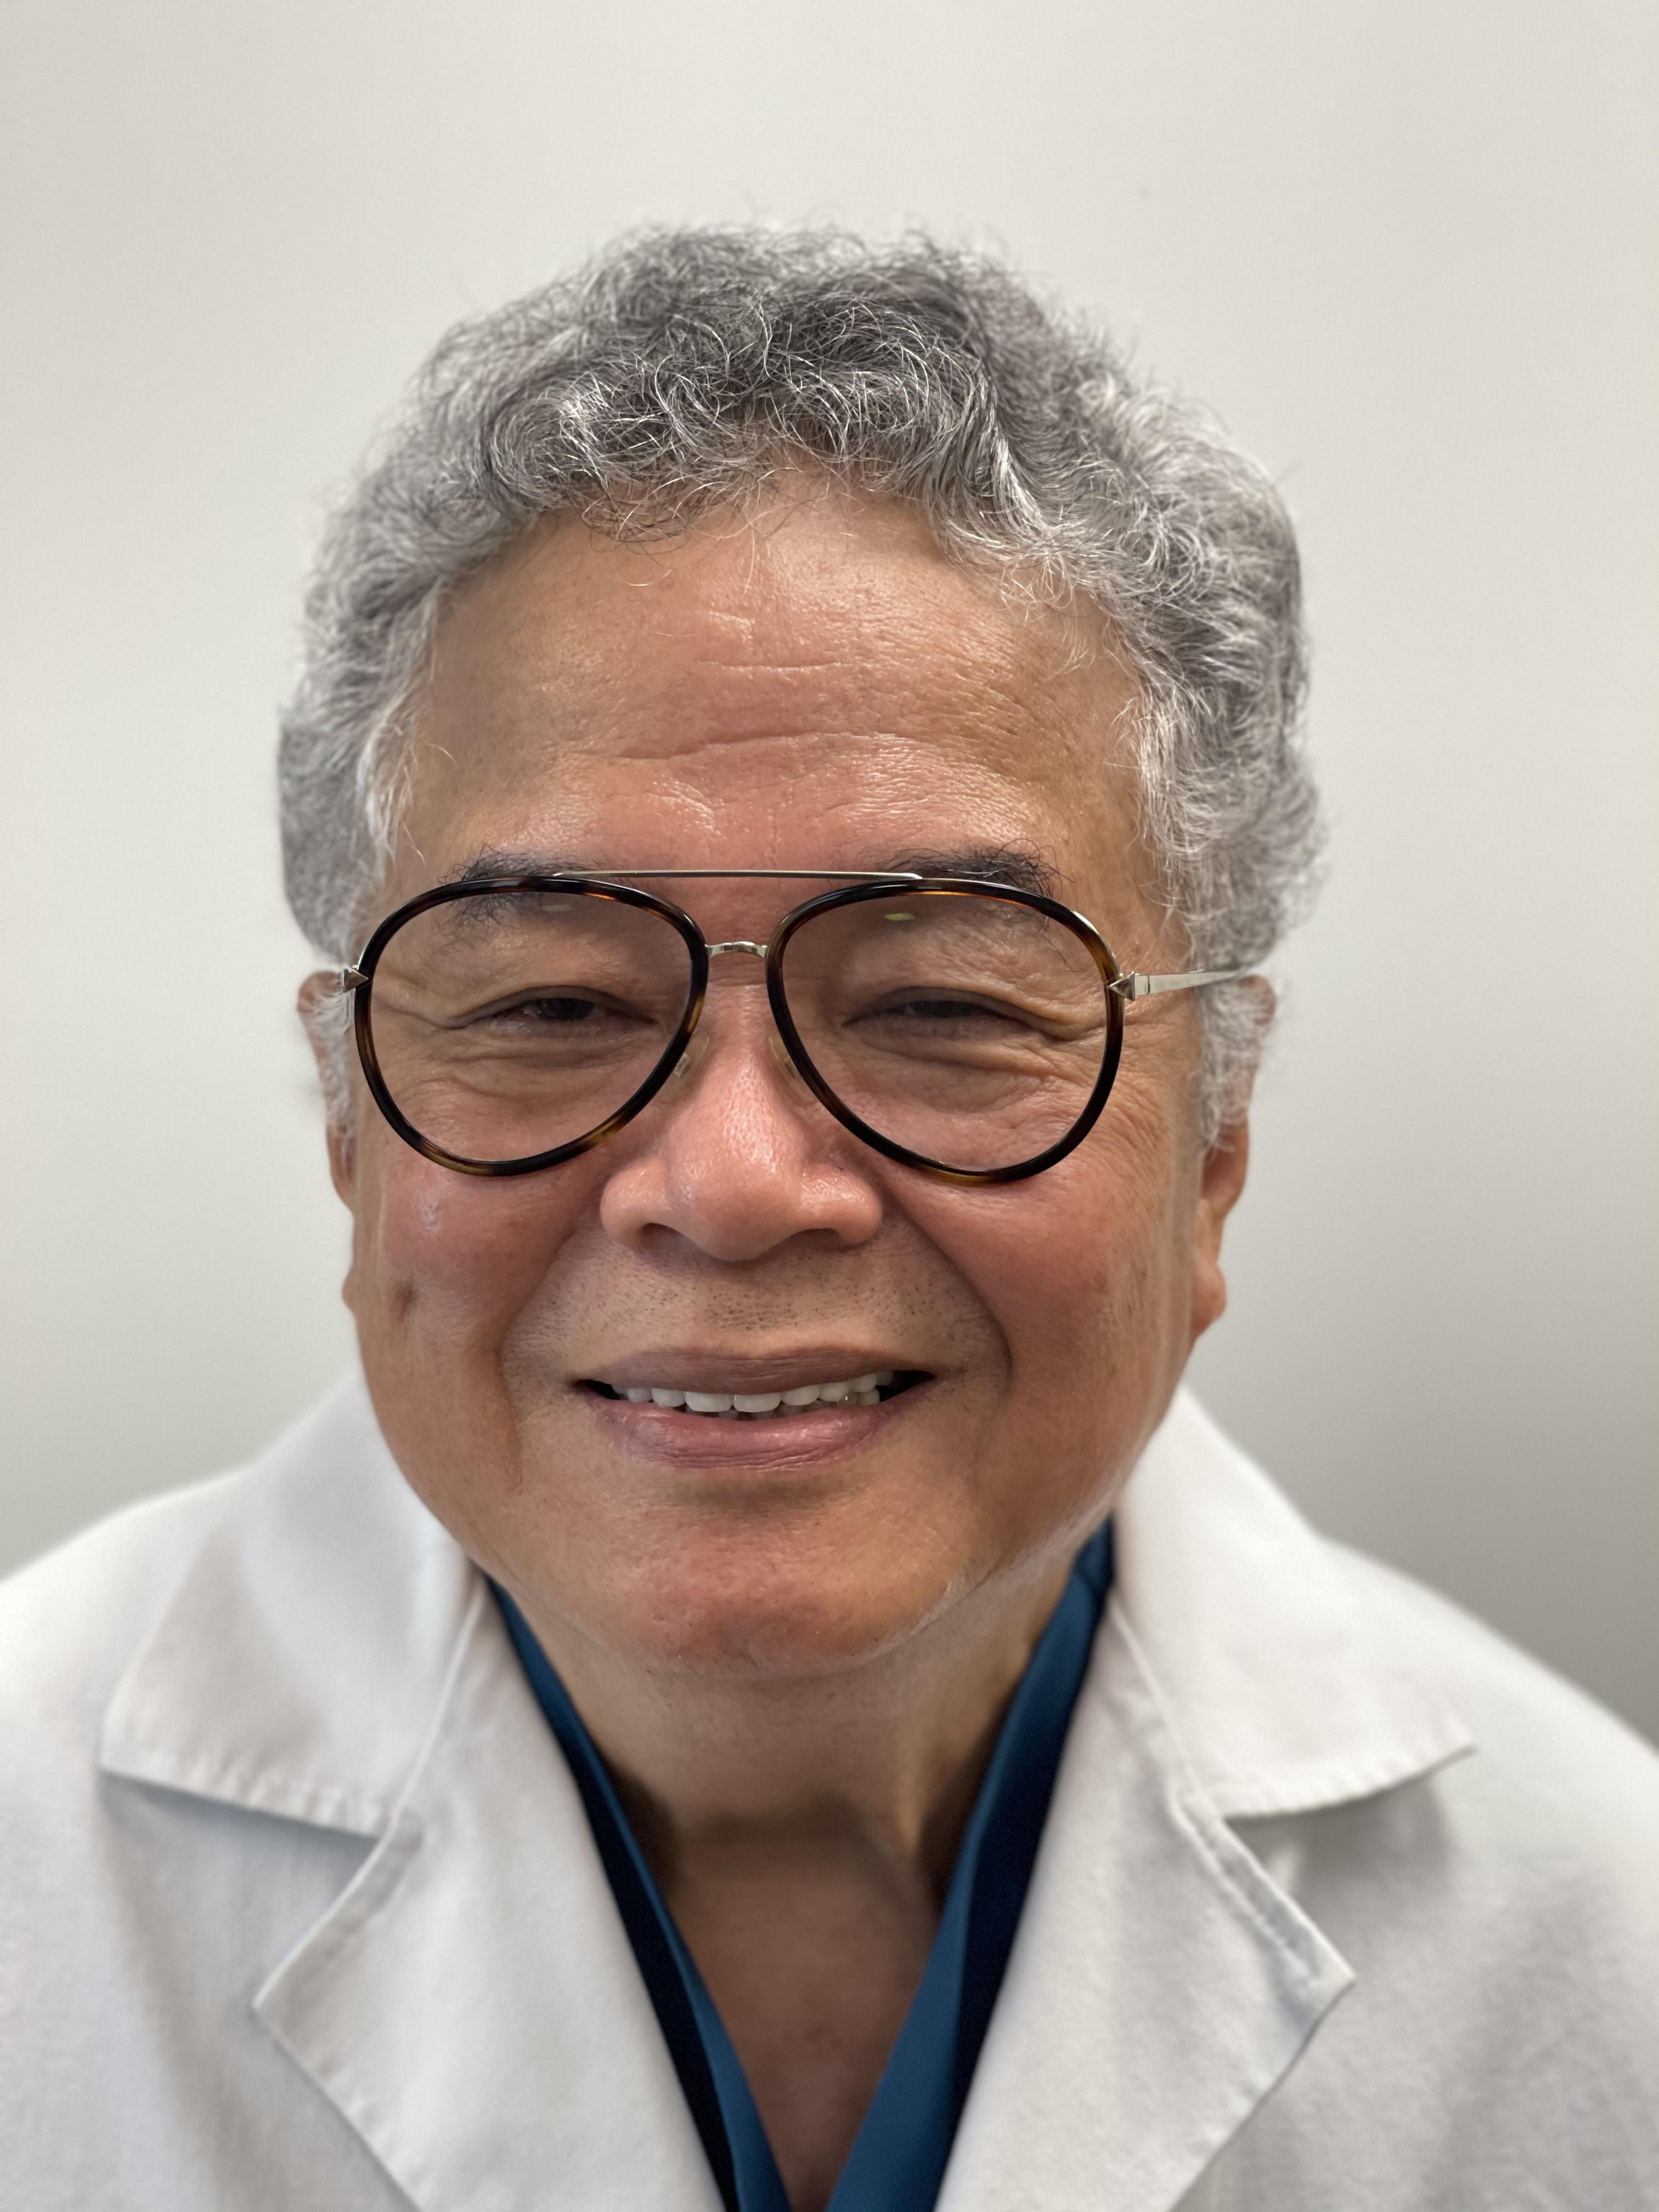 Virgil Carandang, MD